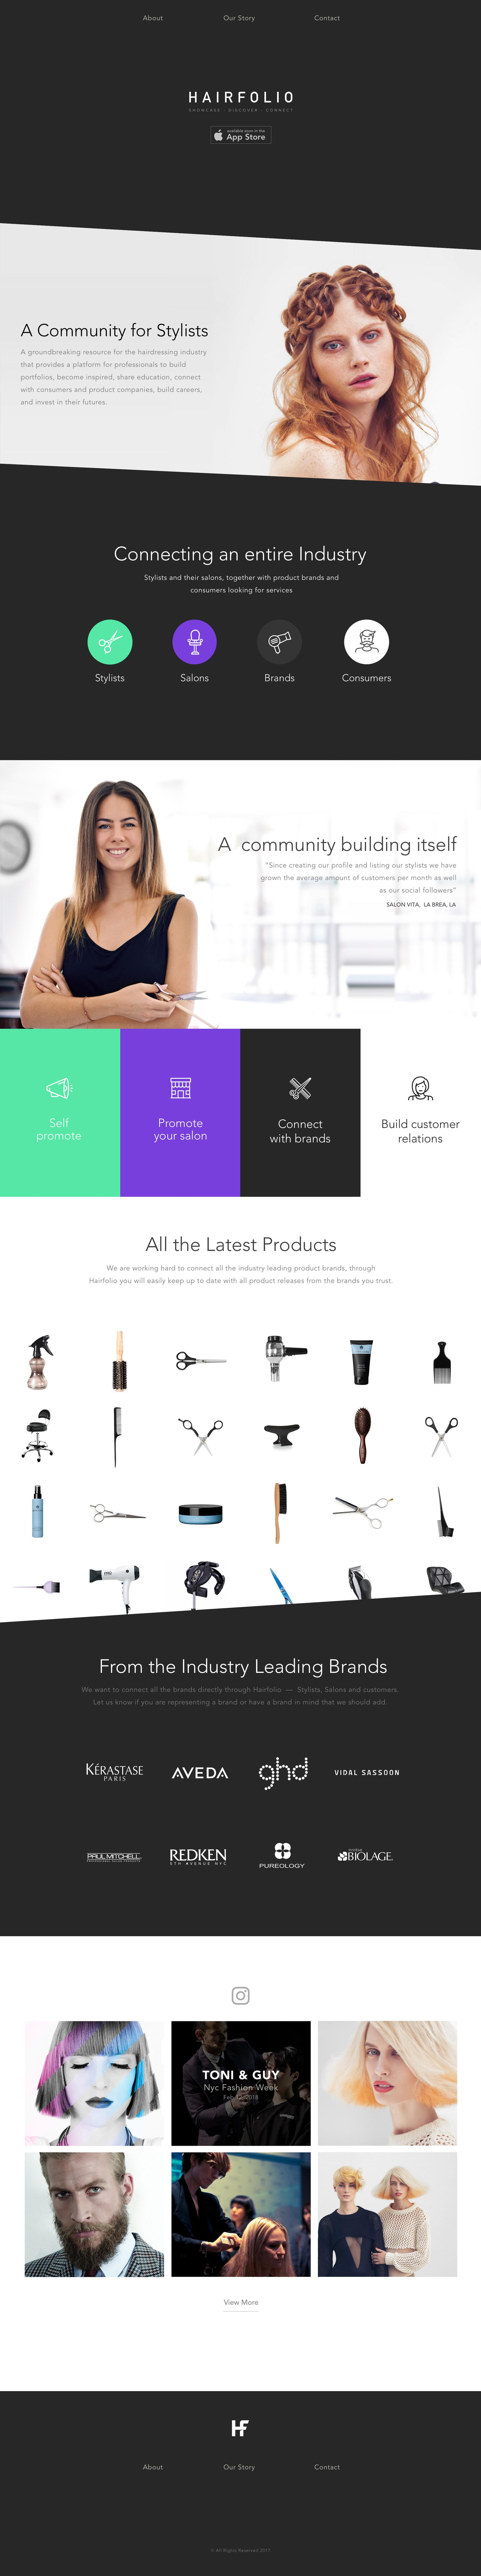 Hairfolio-web-2018_2